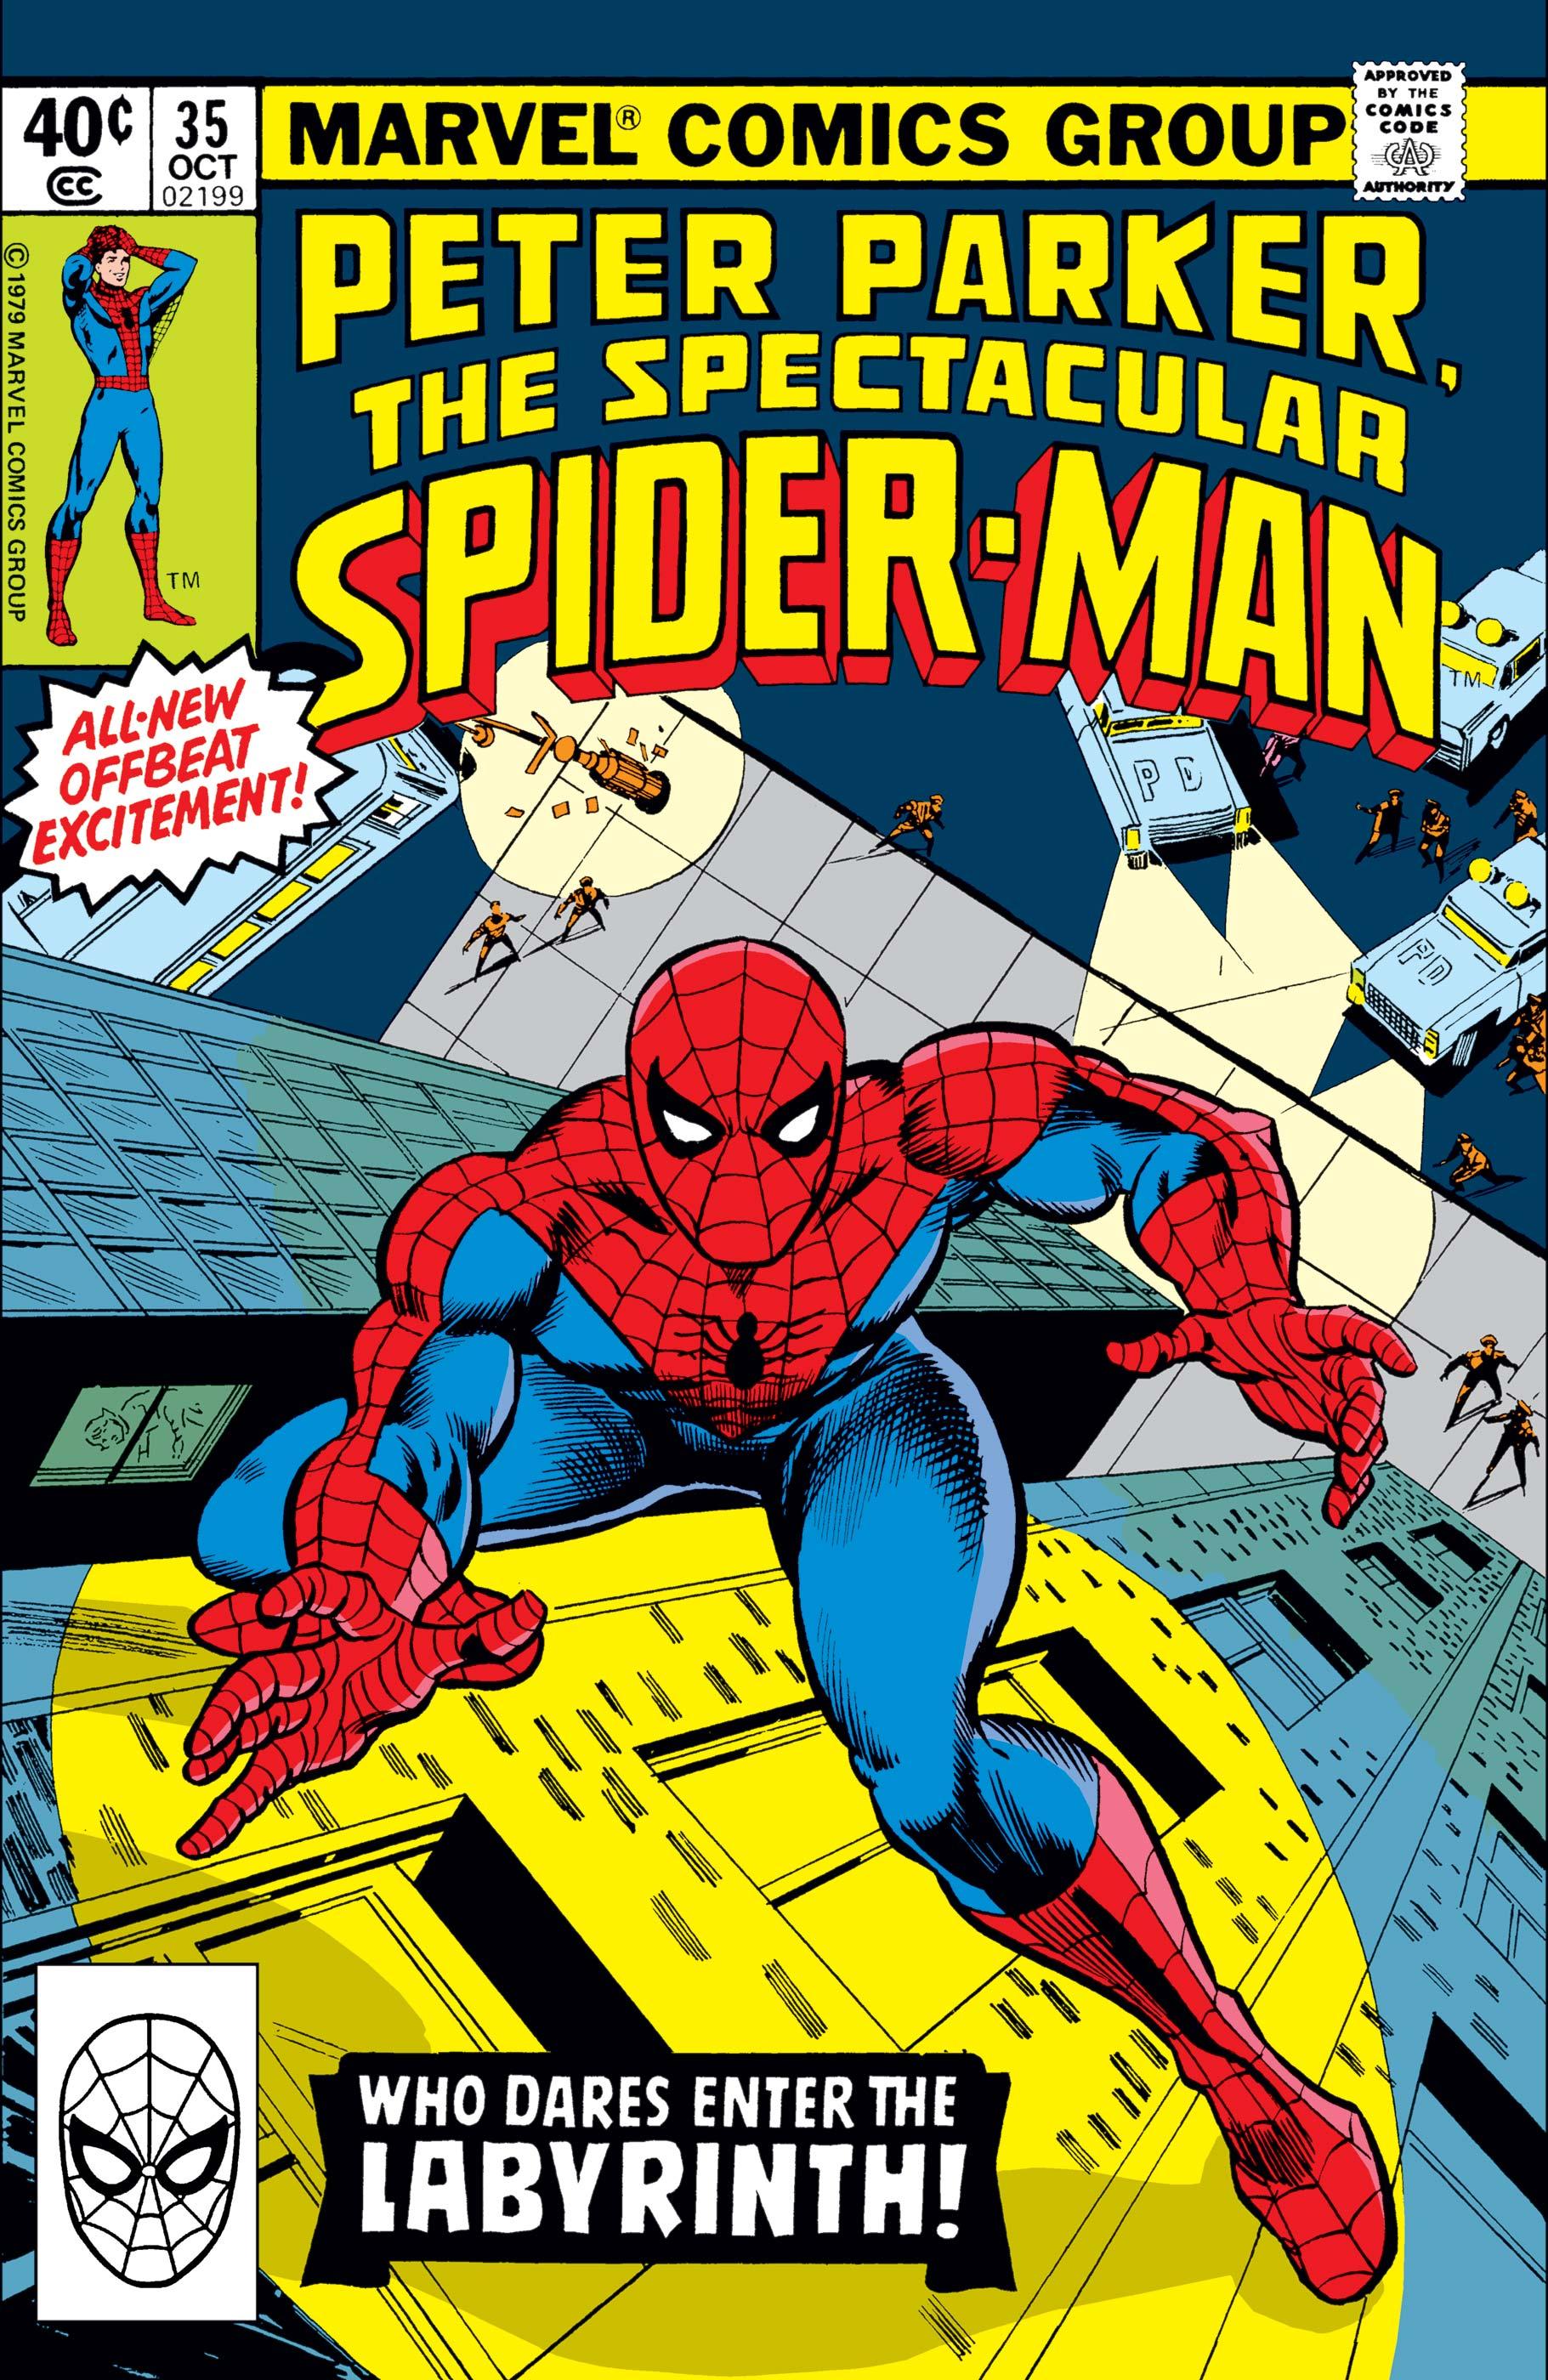 Peter Parker, the Spectacular Spider-Man (1976) #35